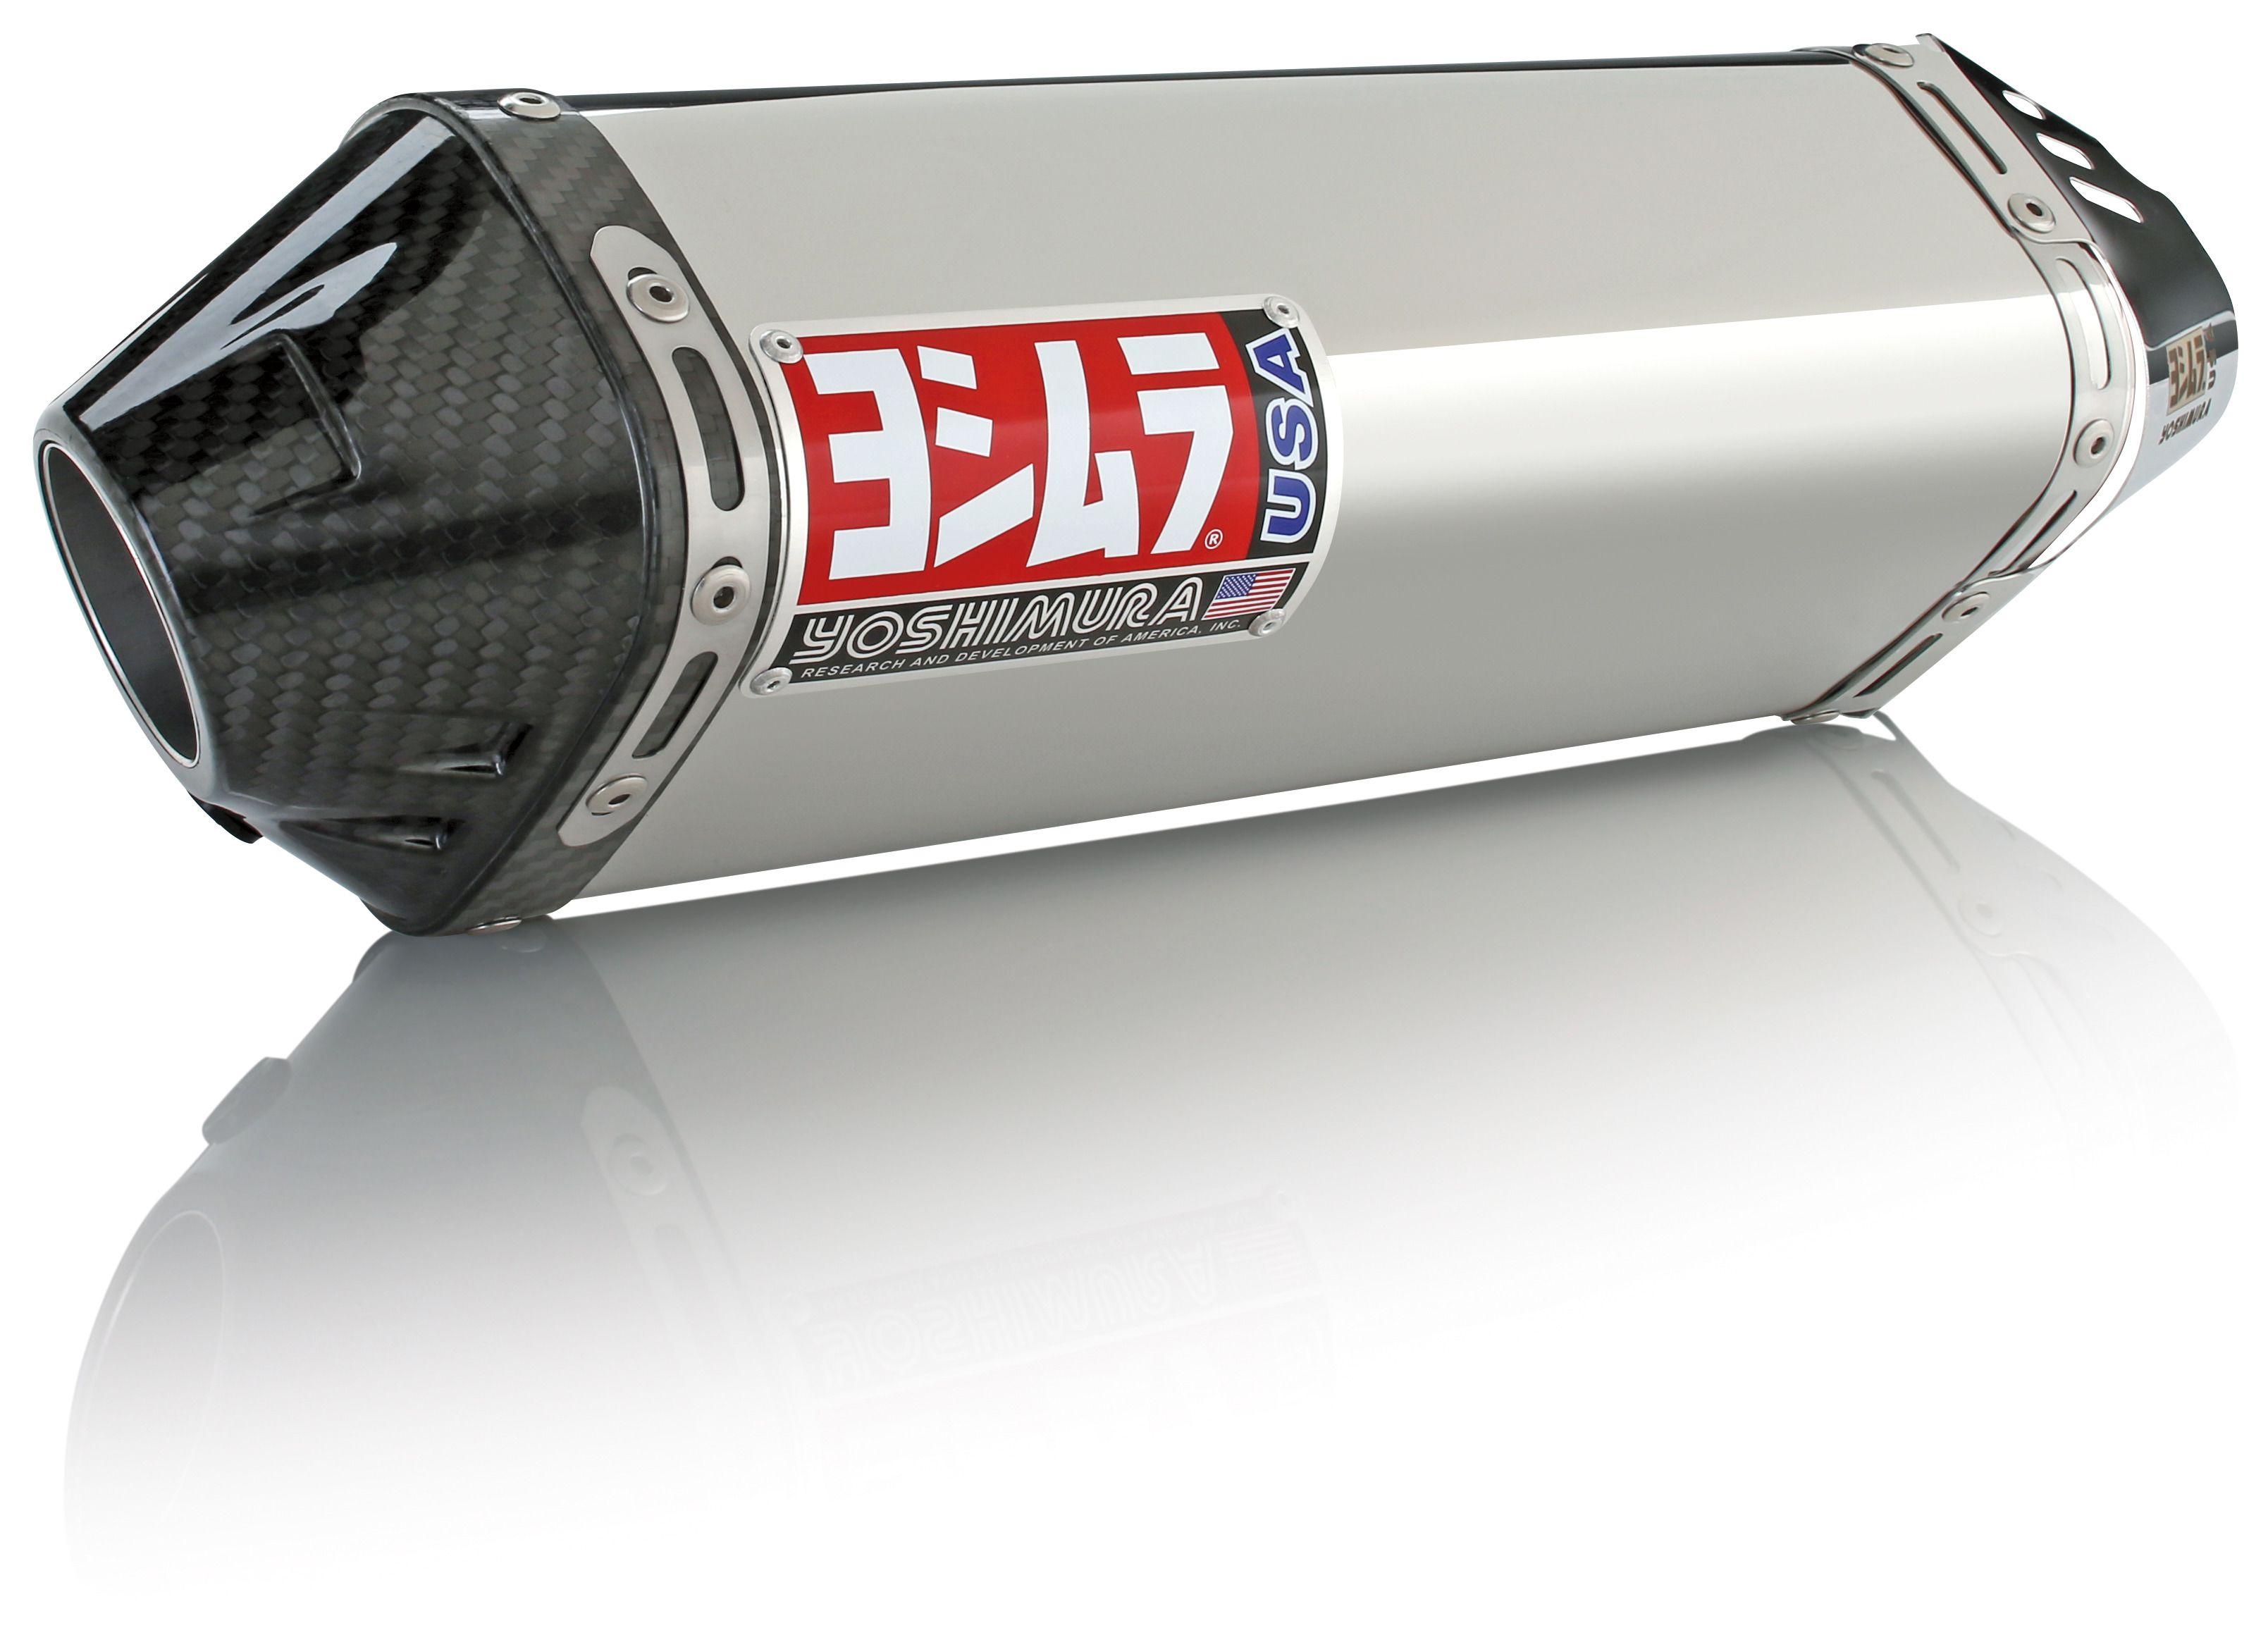 Yoshimura TRC Race Exhaust System Yamaha ZUMA 125 2009-2015 | 5% ($25 95)  Off!